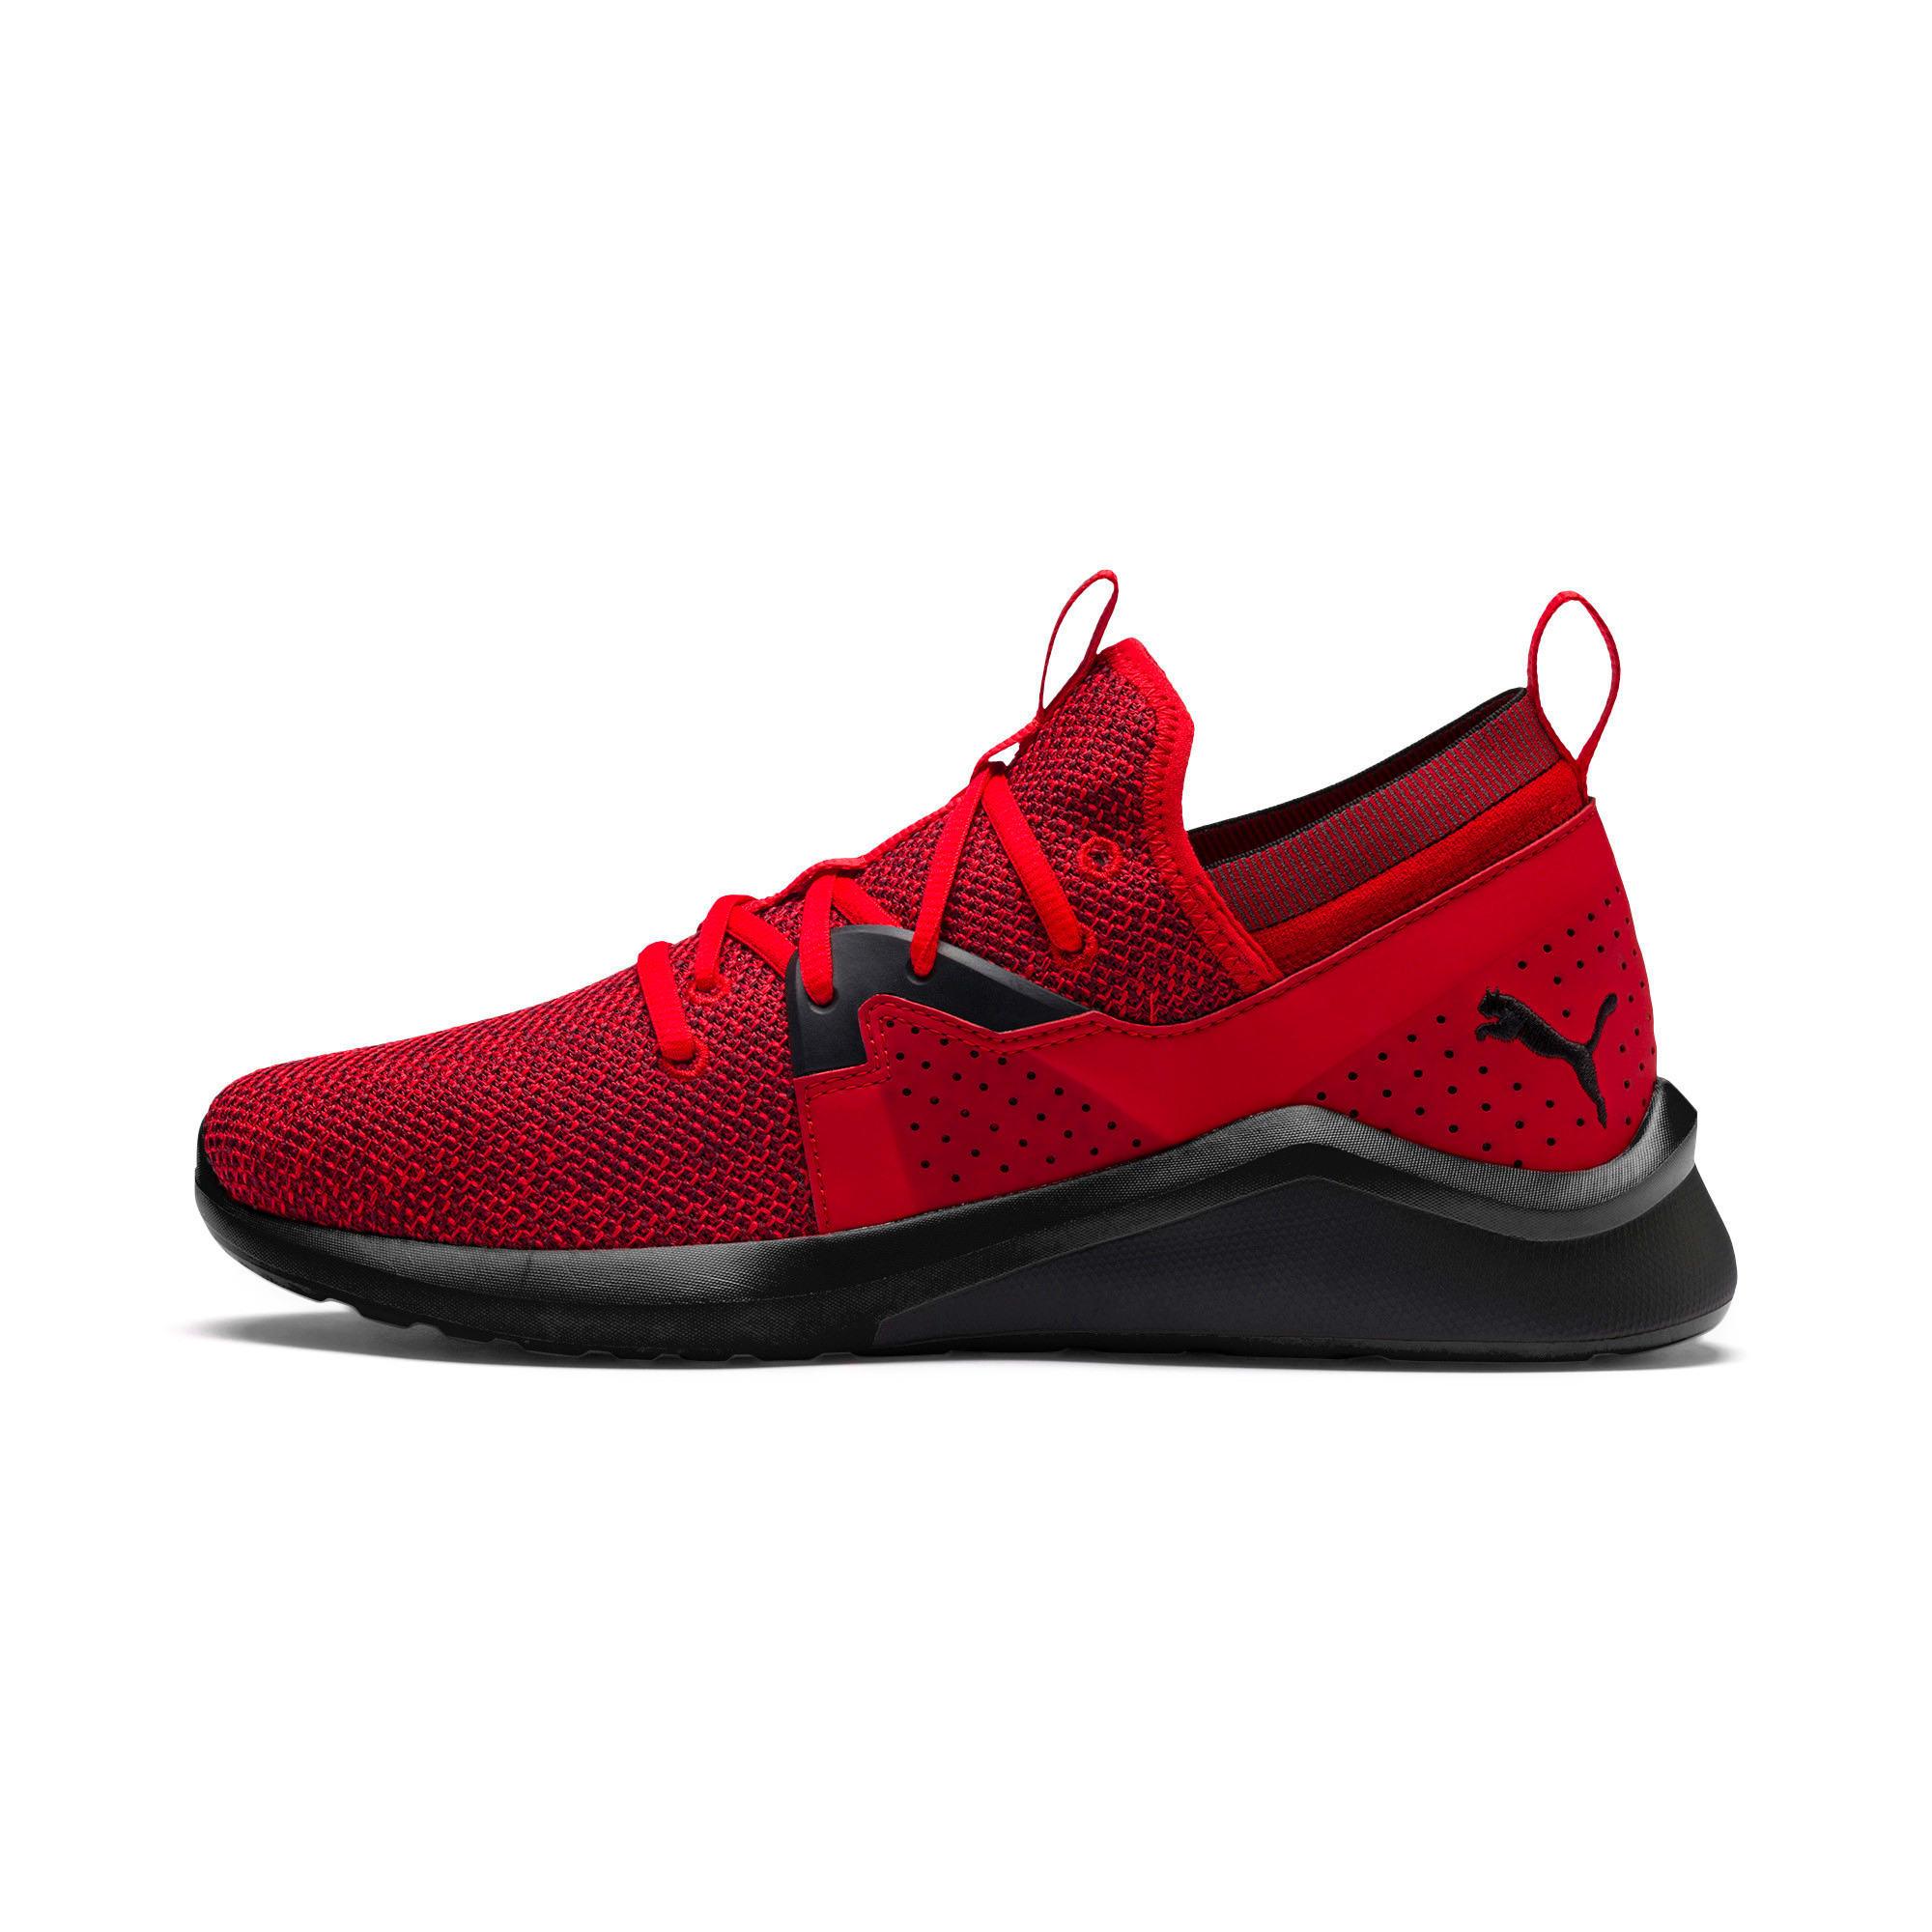 Thumbnail 1 of Emergence Men's Running Shoes, High Risk Red-Puma Black, medium-IND